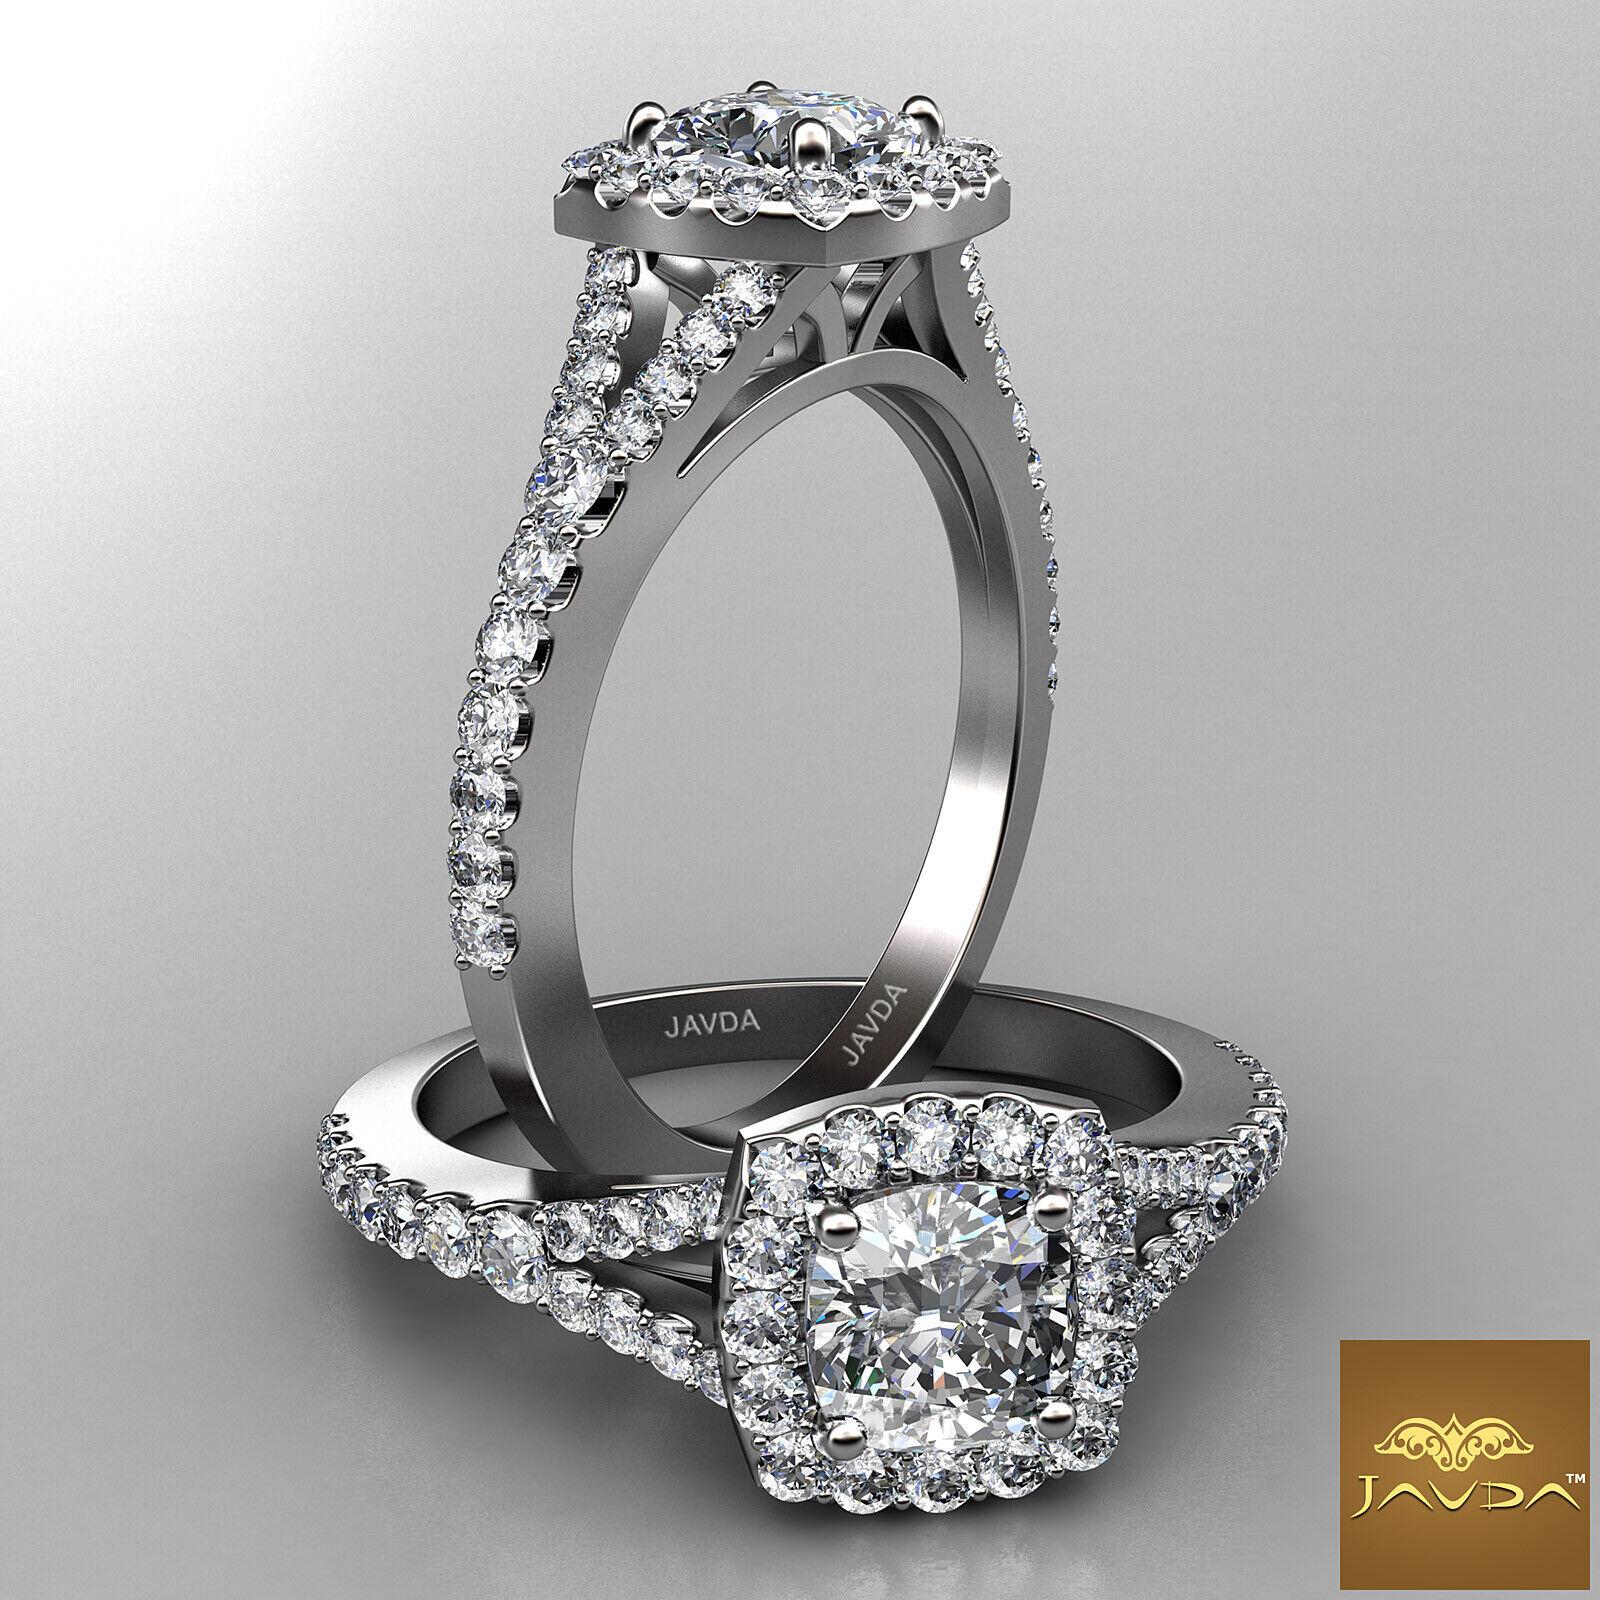 Halo Split Shank French Pave Set Cushion Diamond Engagement Ring GIA F VS1 1 Ct